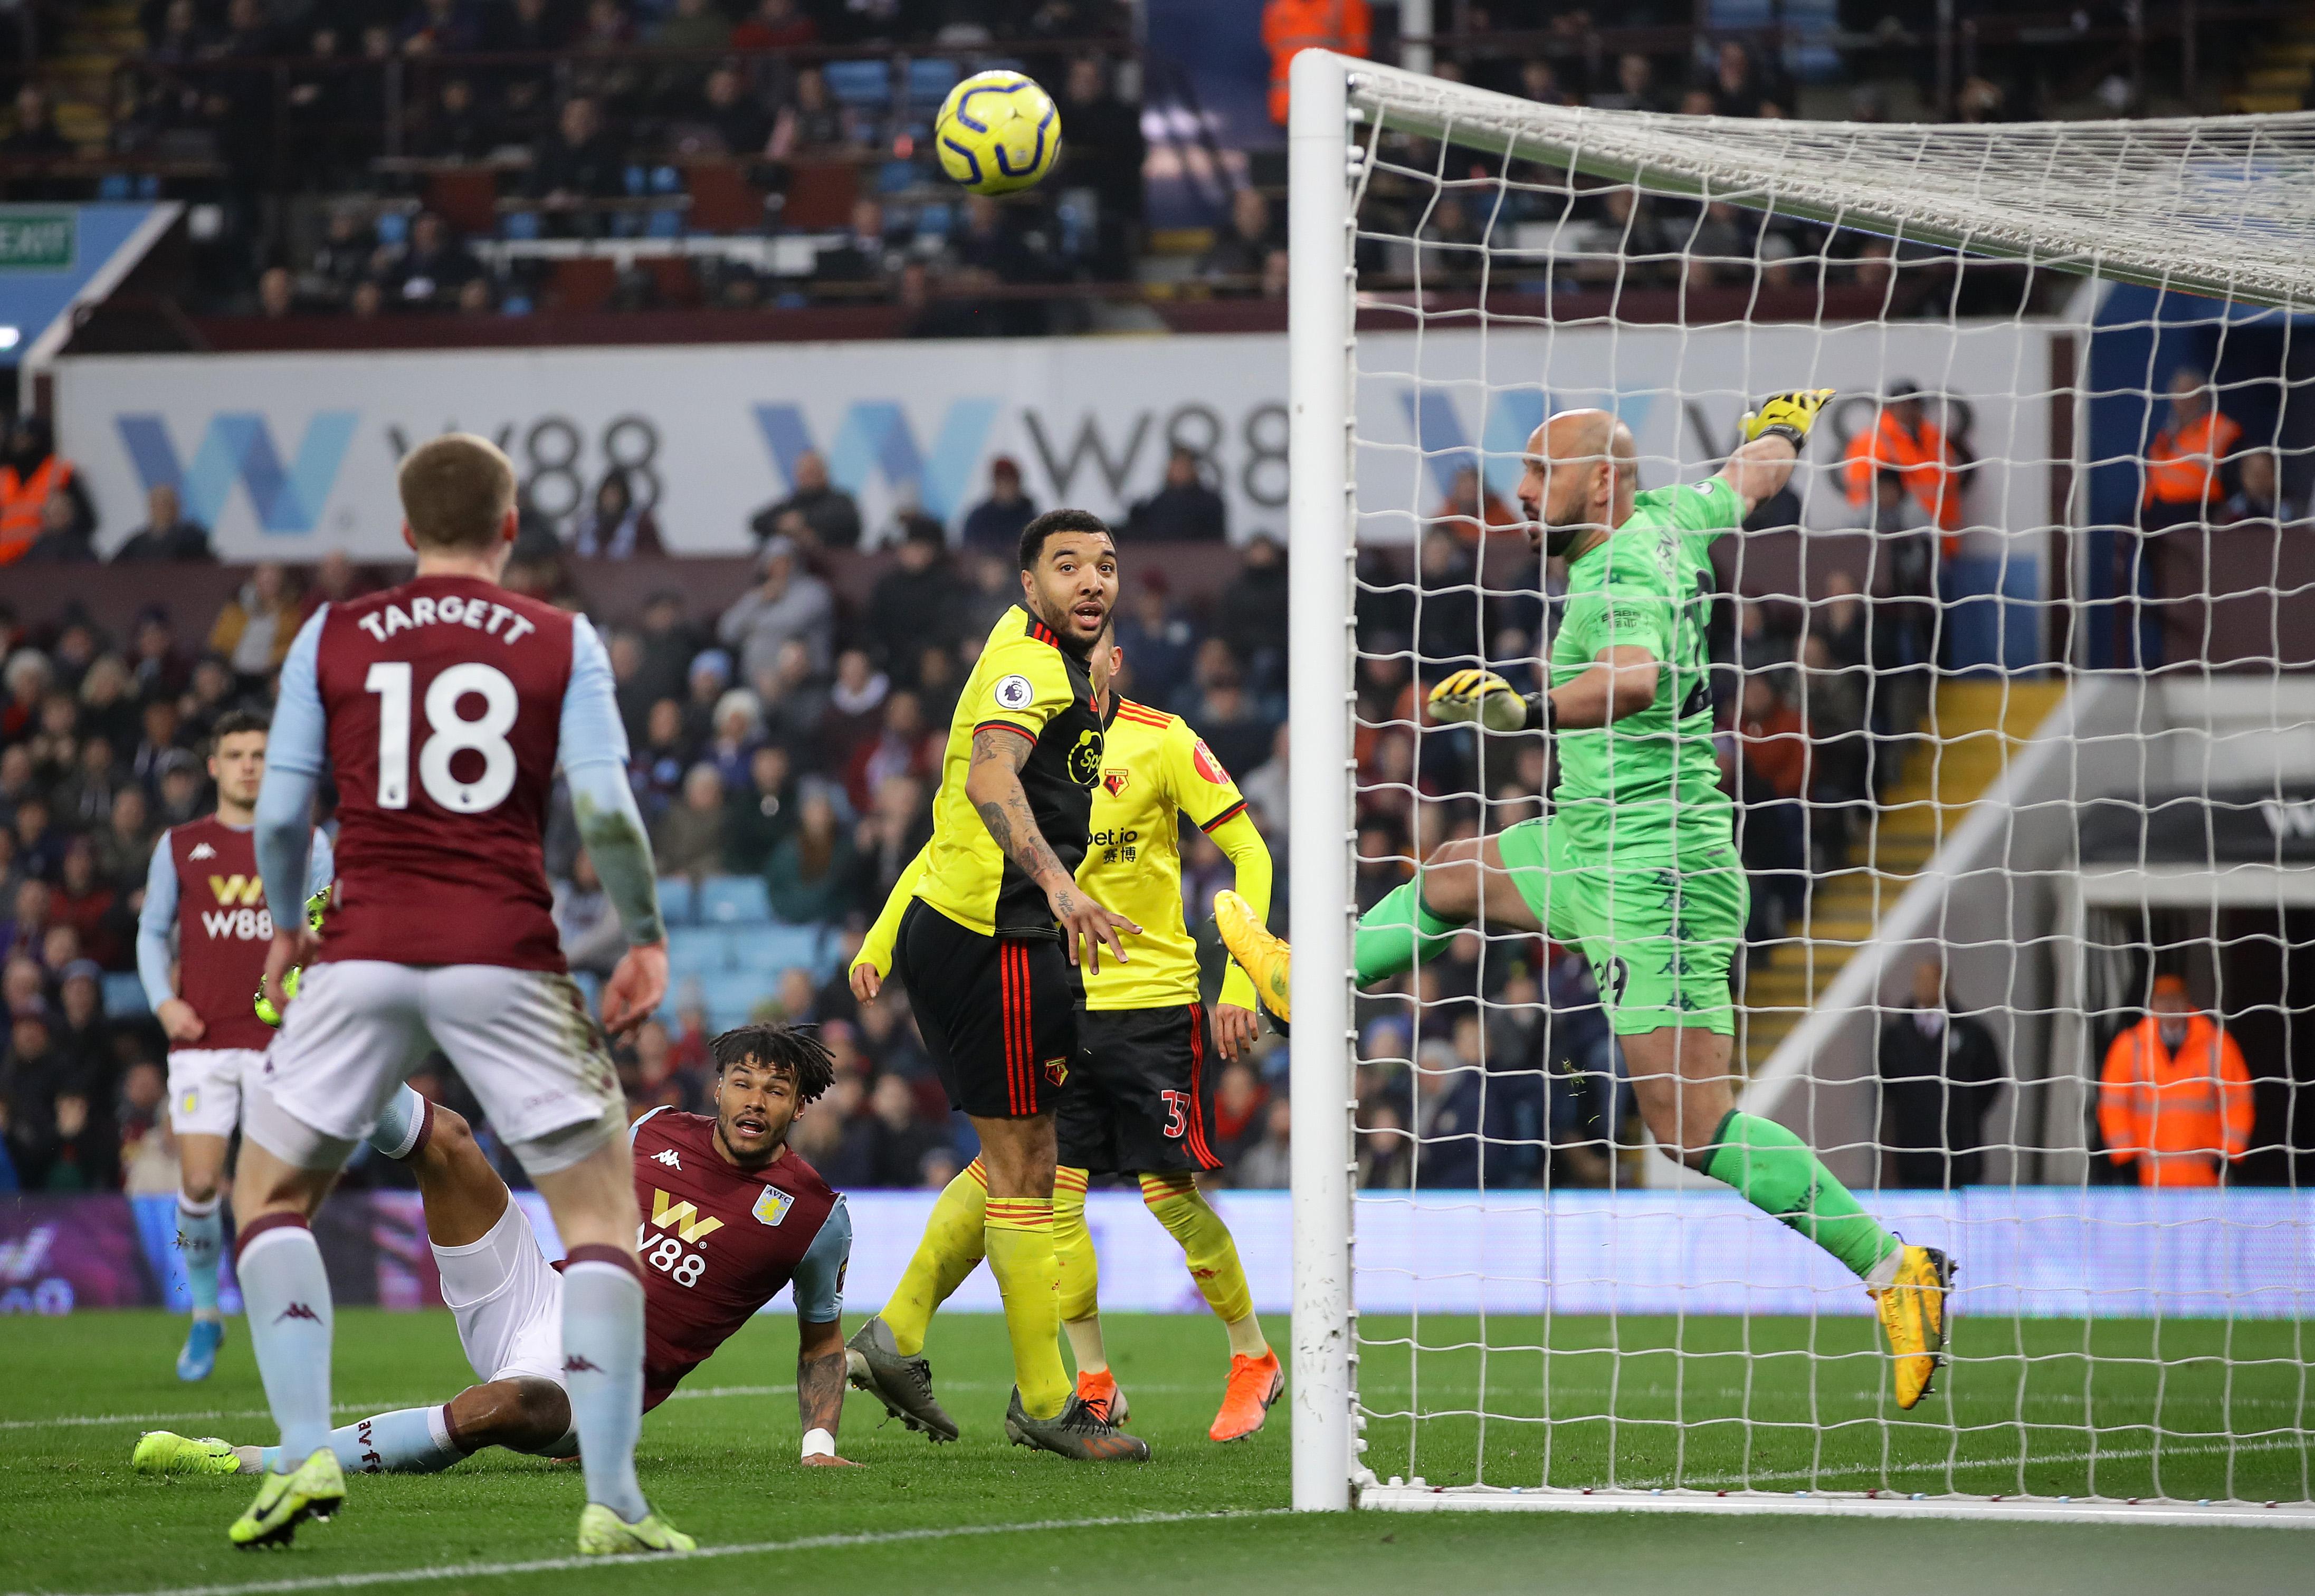 Aston Villa have made fans hope again